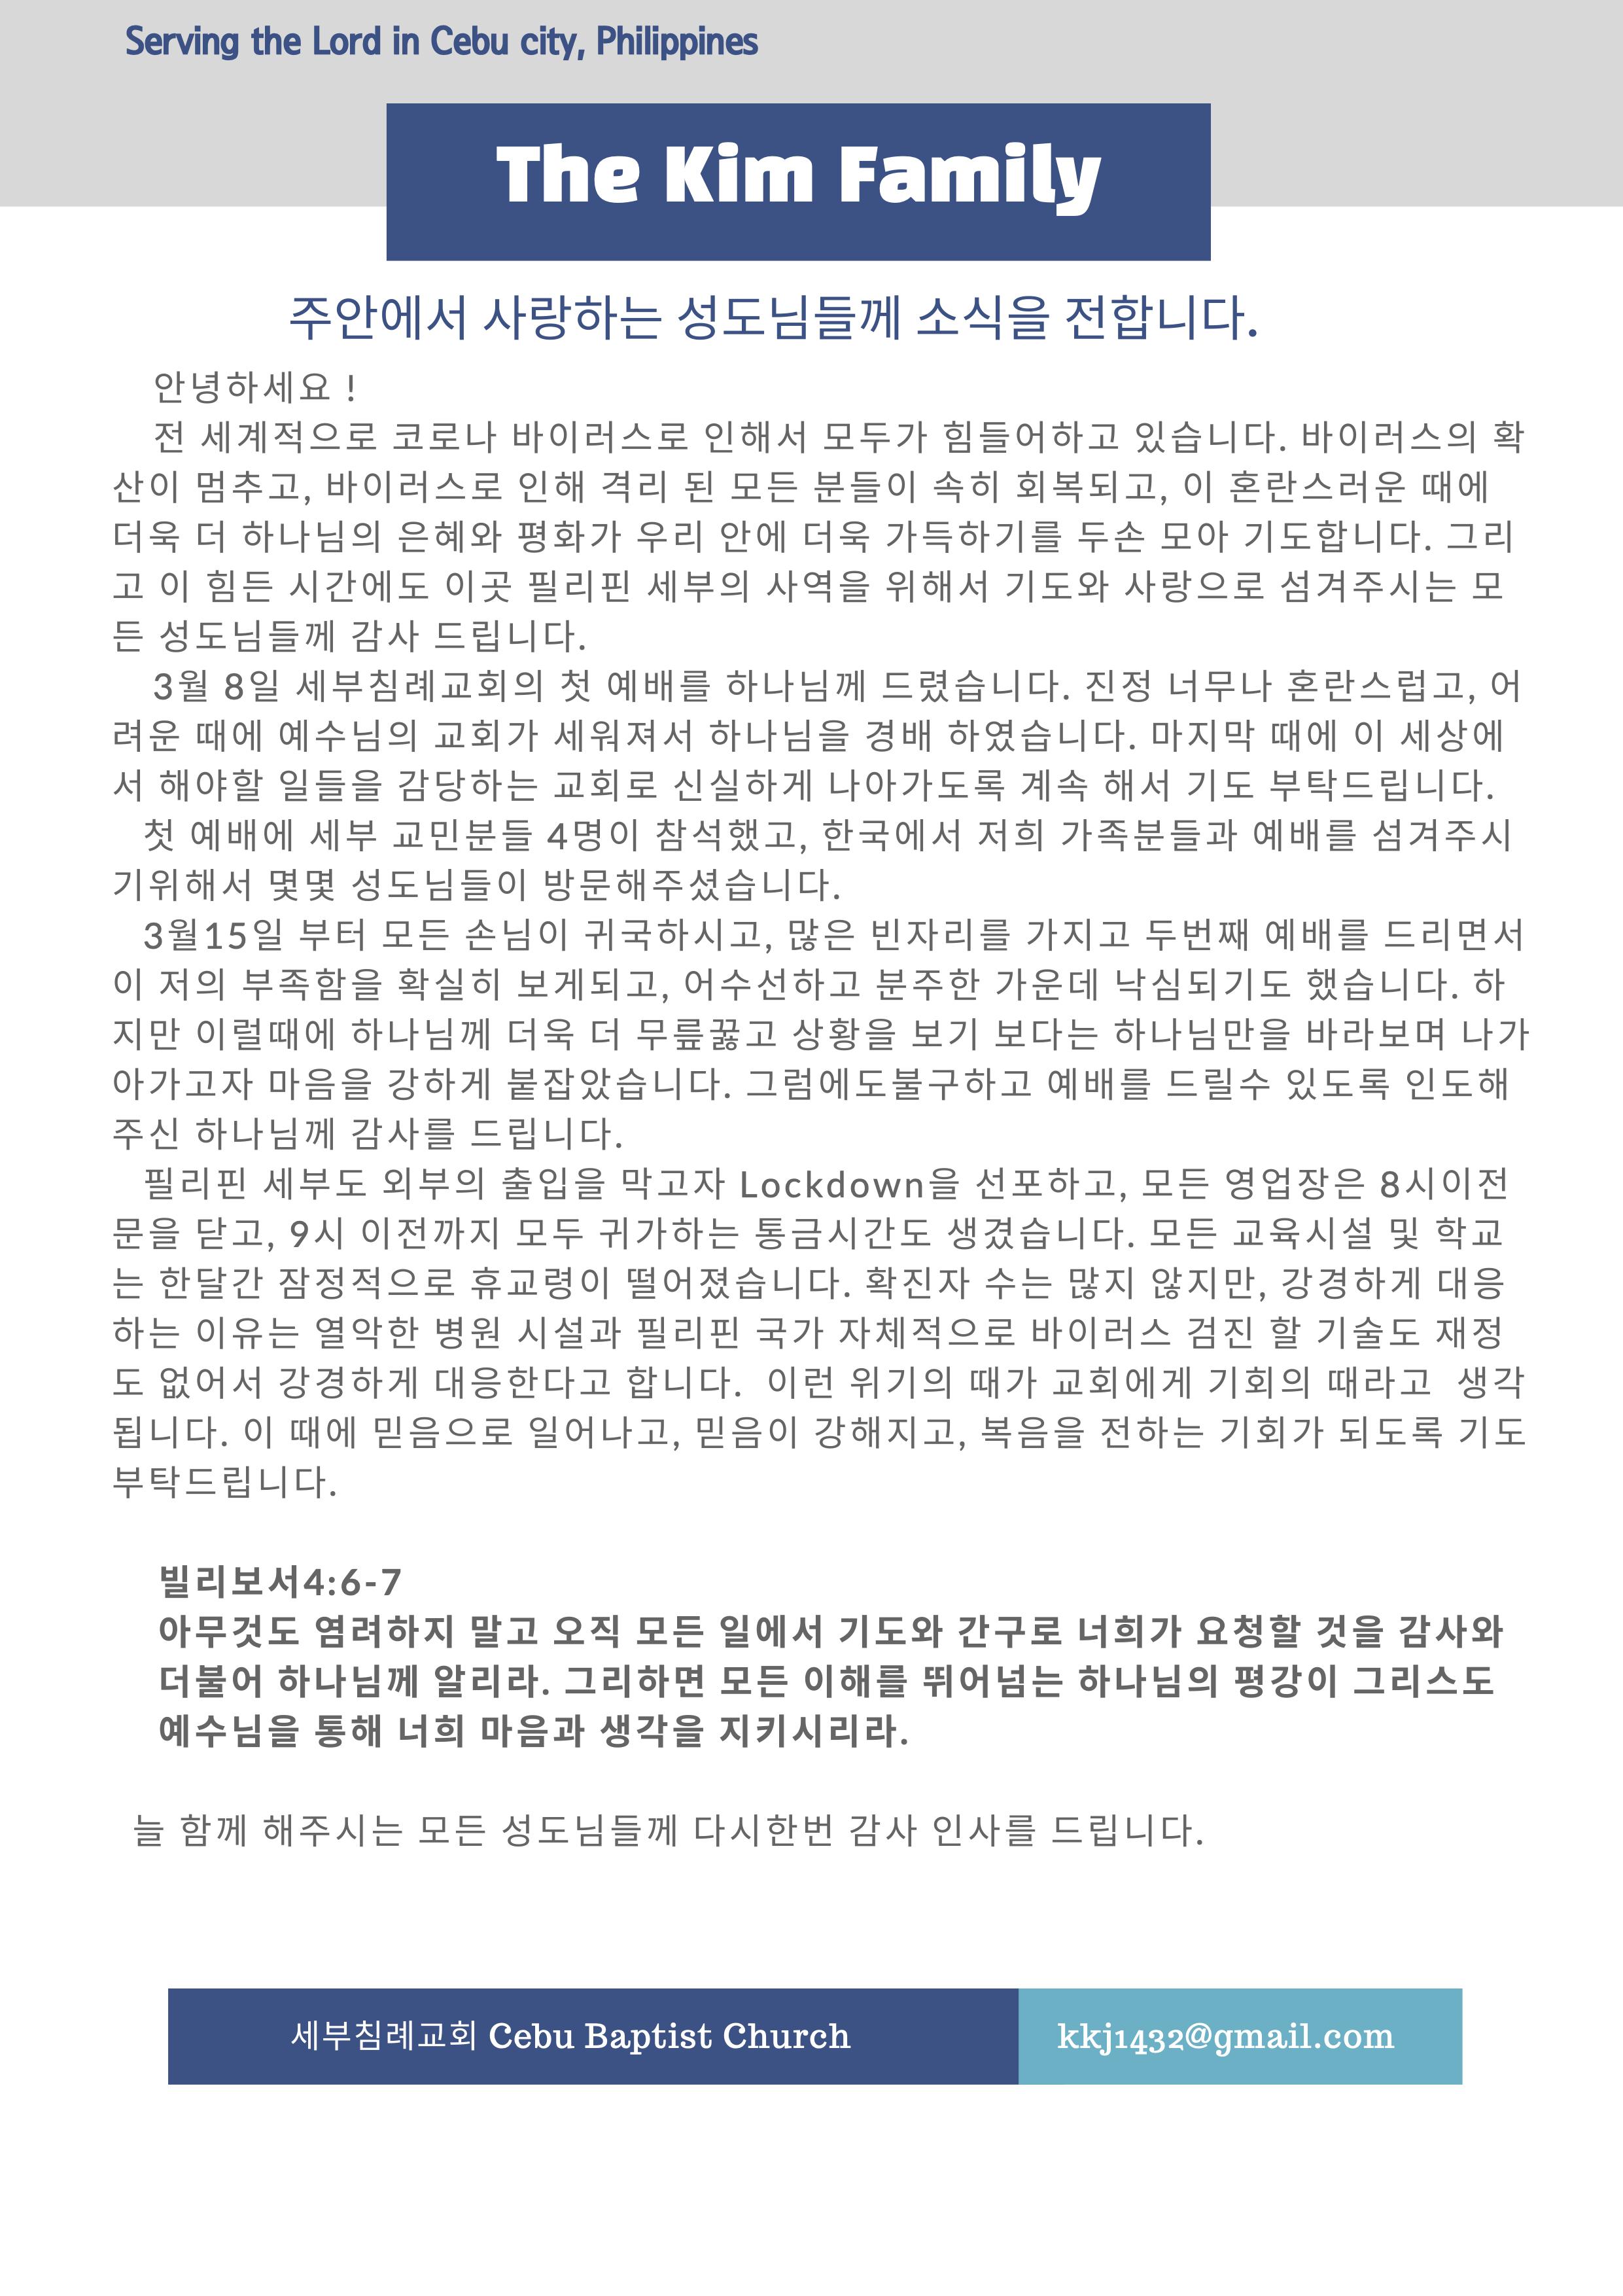 The Kim Family (4).jpg